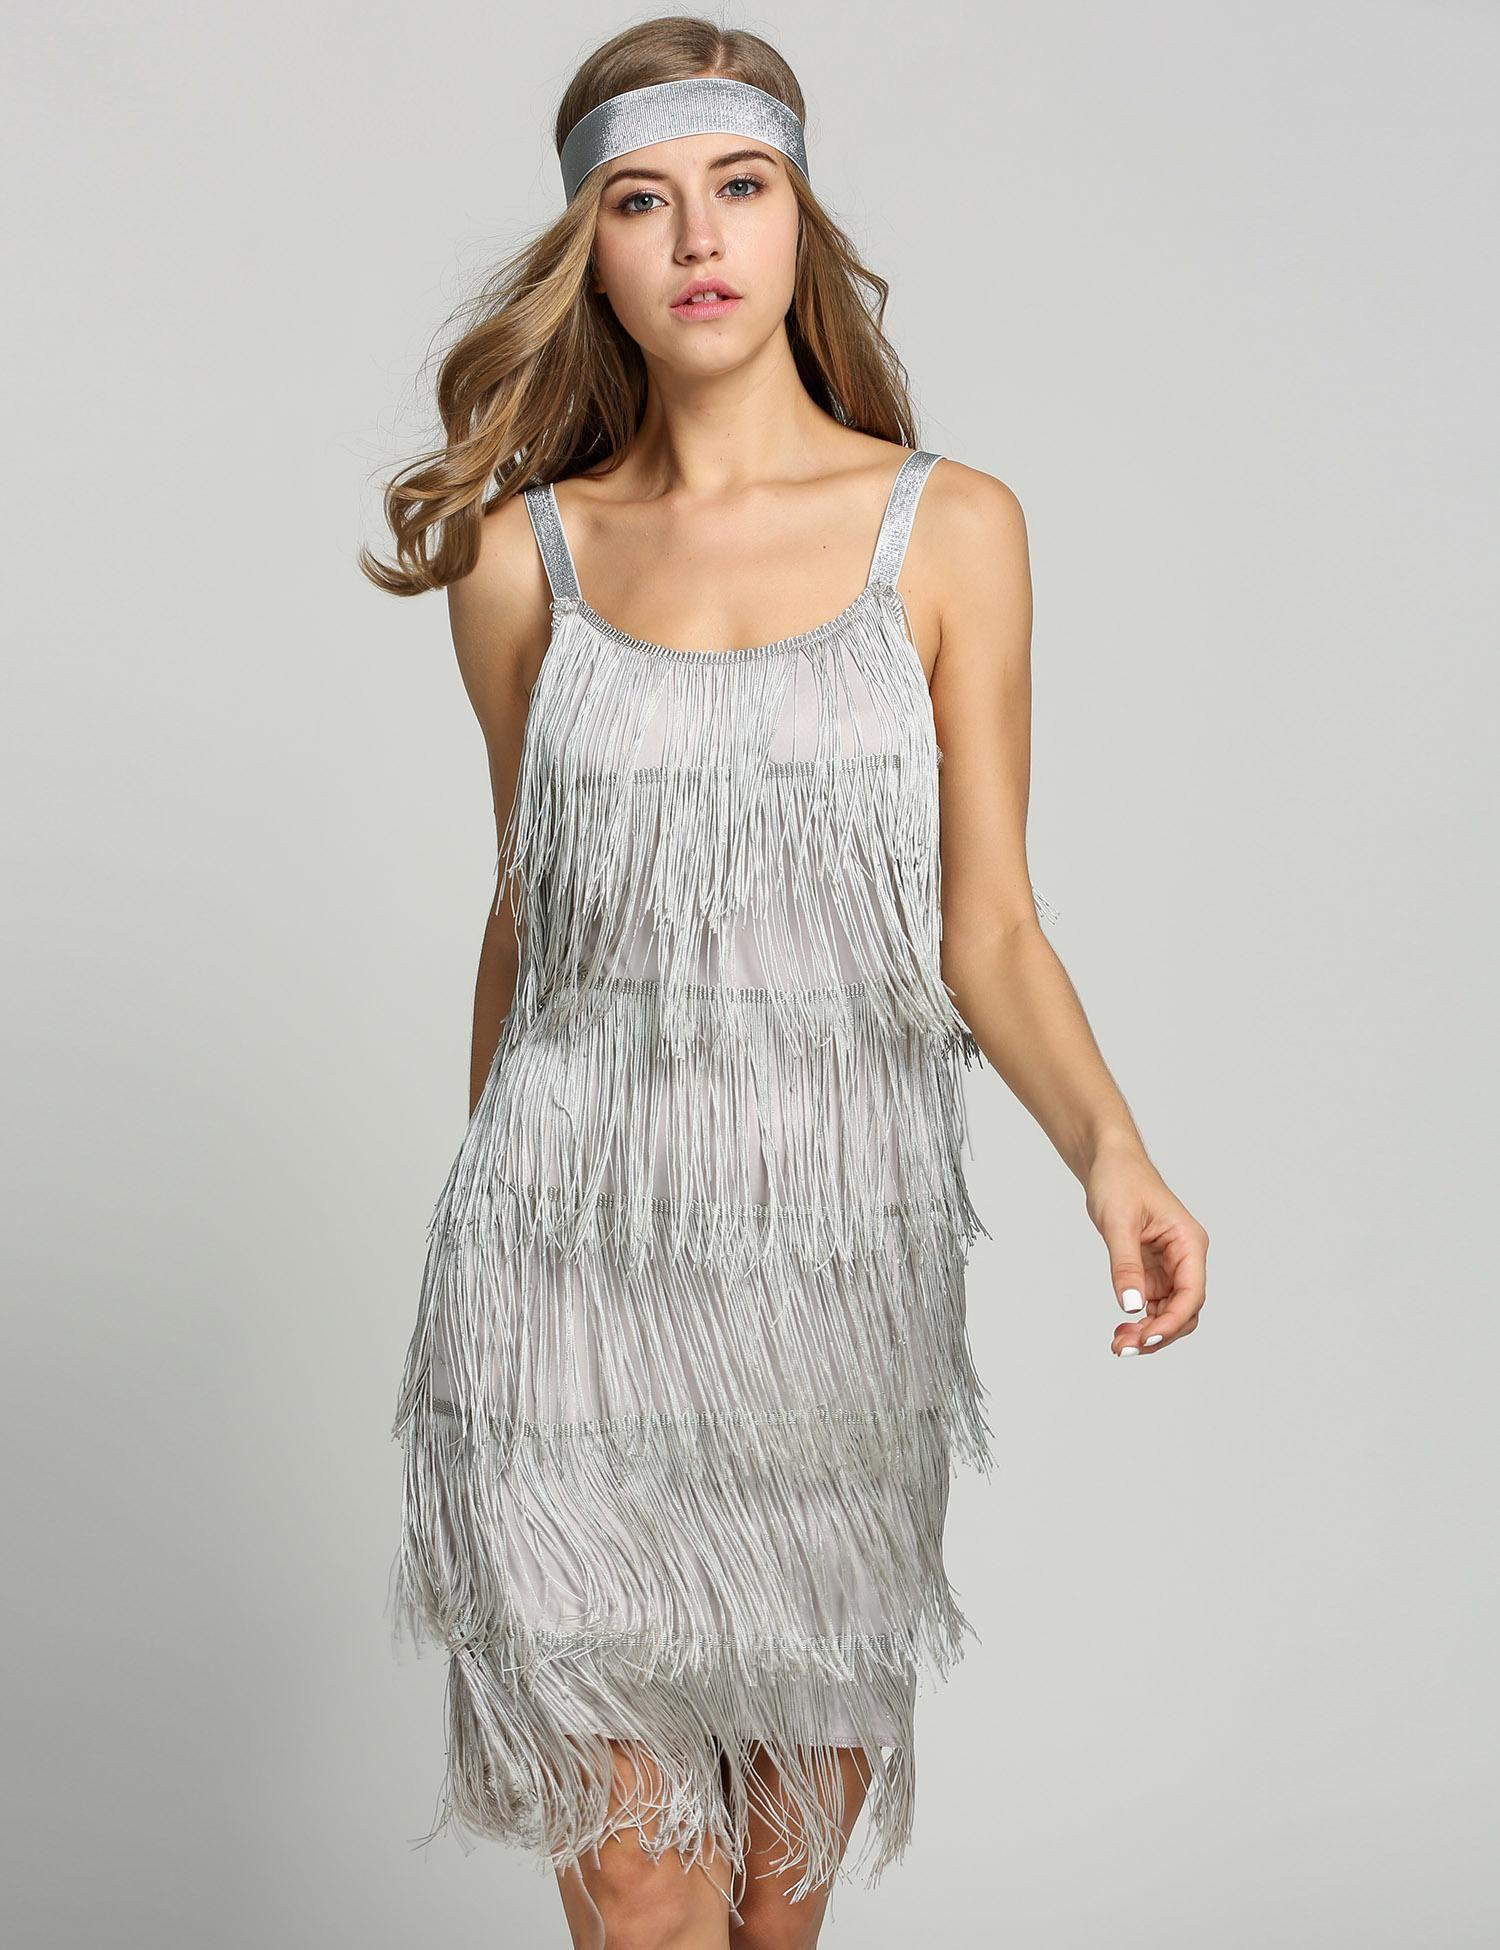 Glam Gatsby Fringe Flapper Trajes Vestidos de Fiesta dresslink.com ...